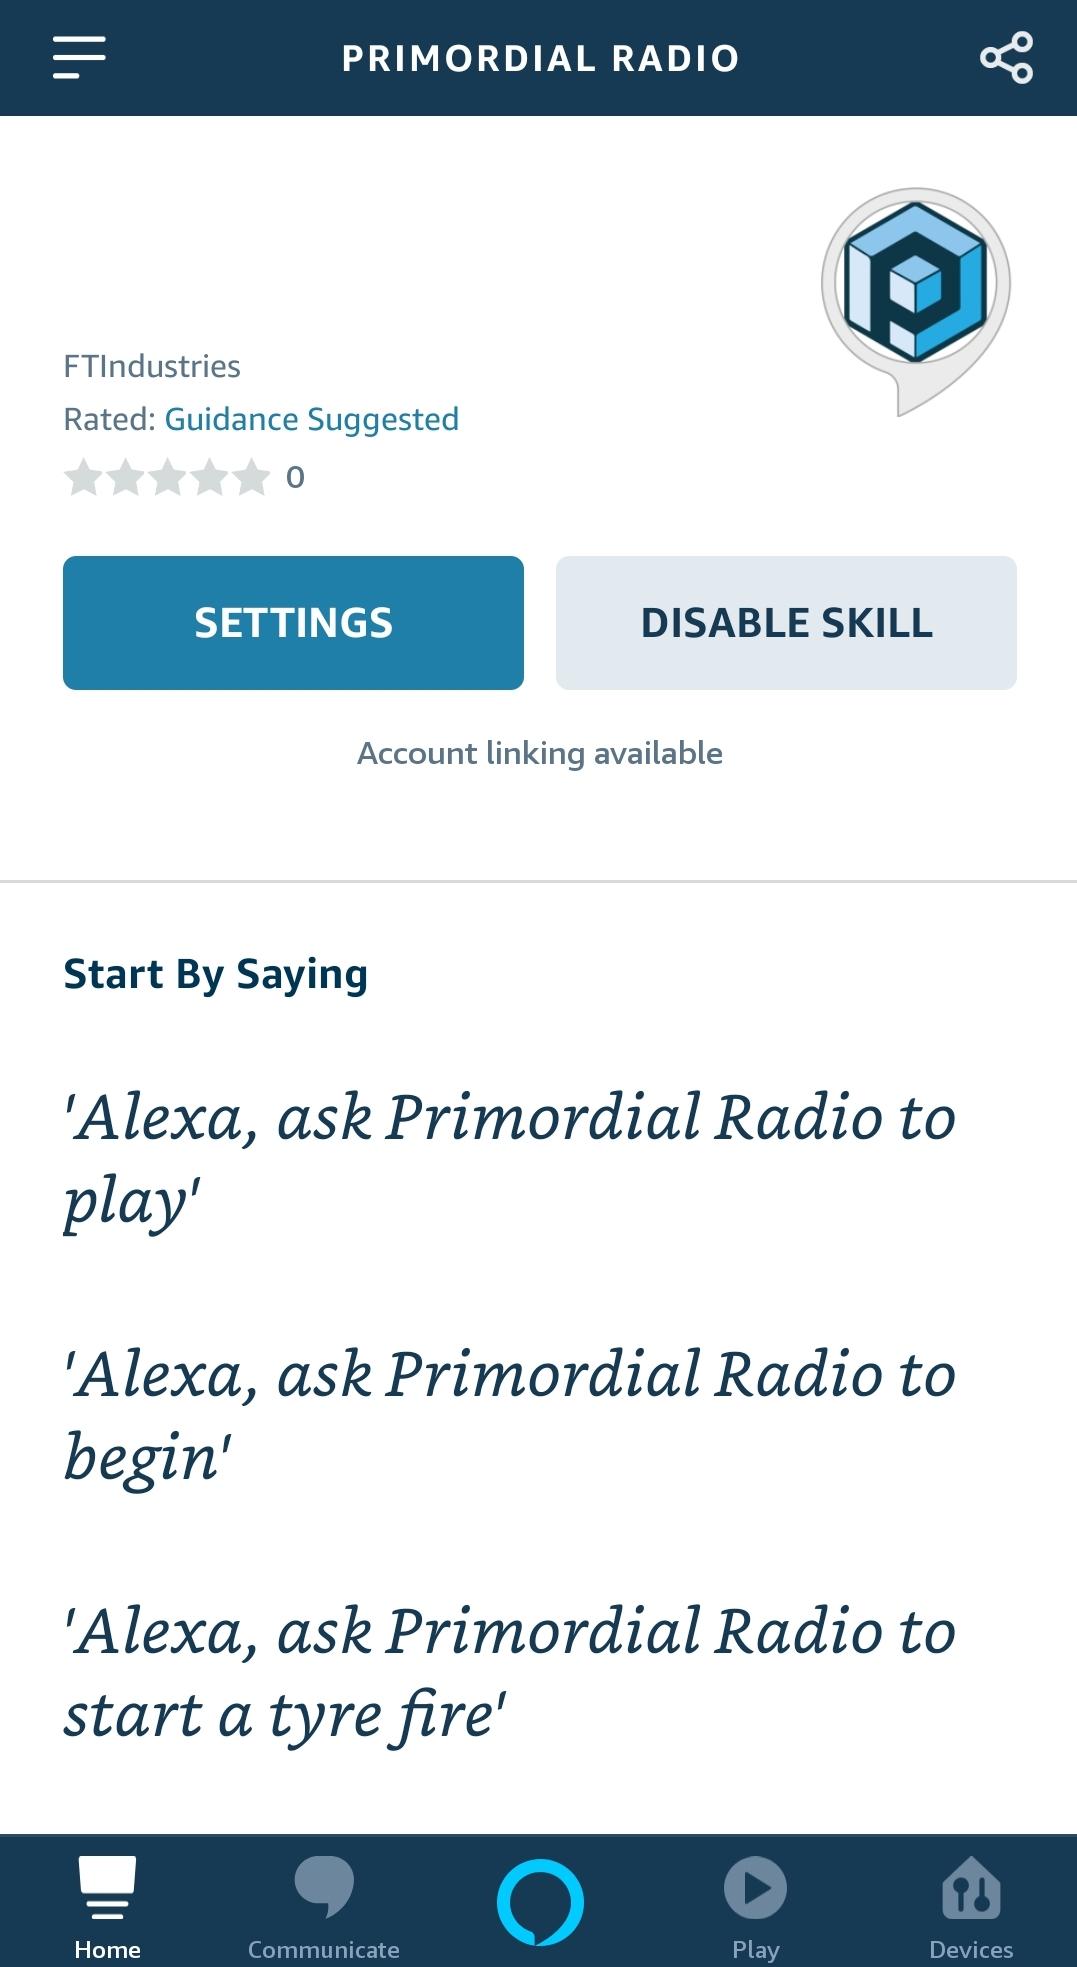 Primordial Radio Alexa Skill image